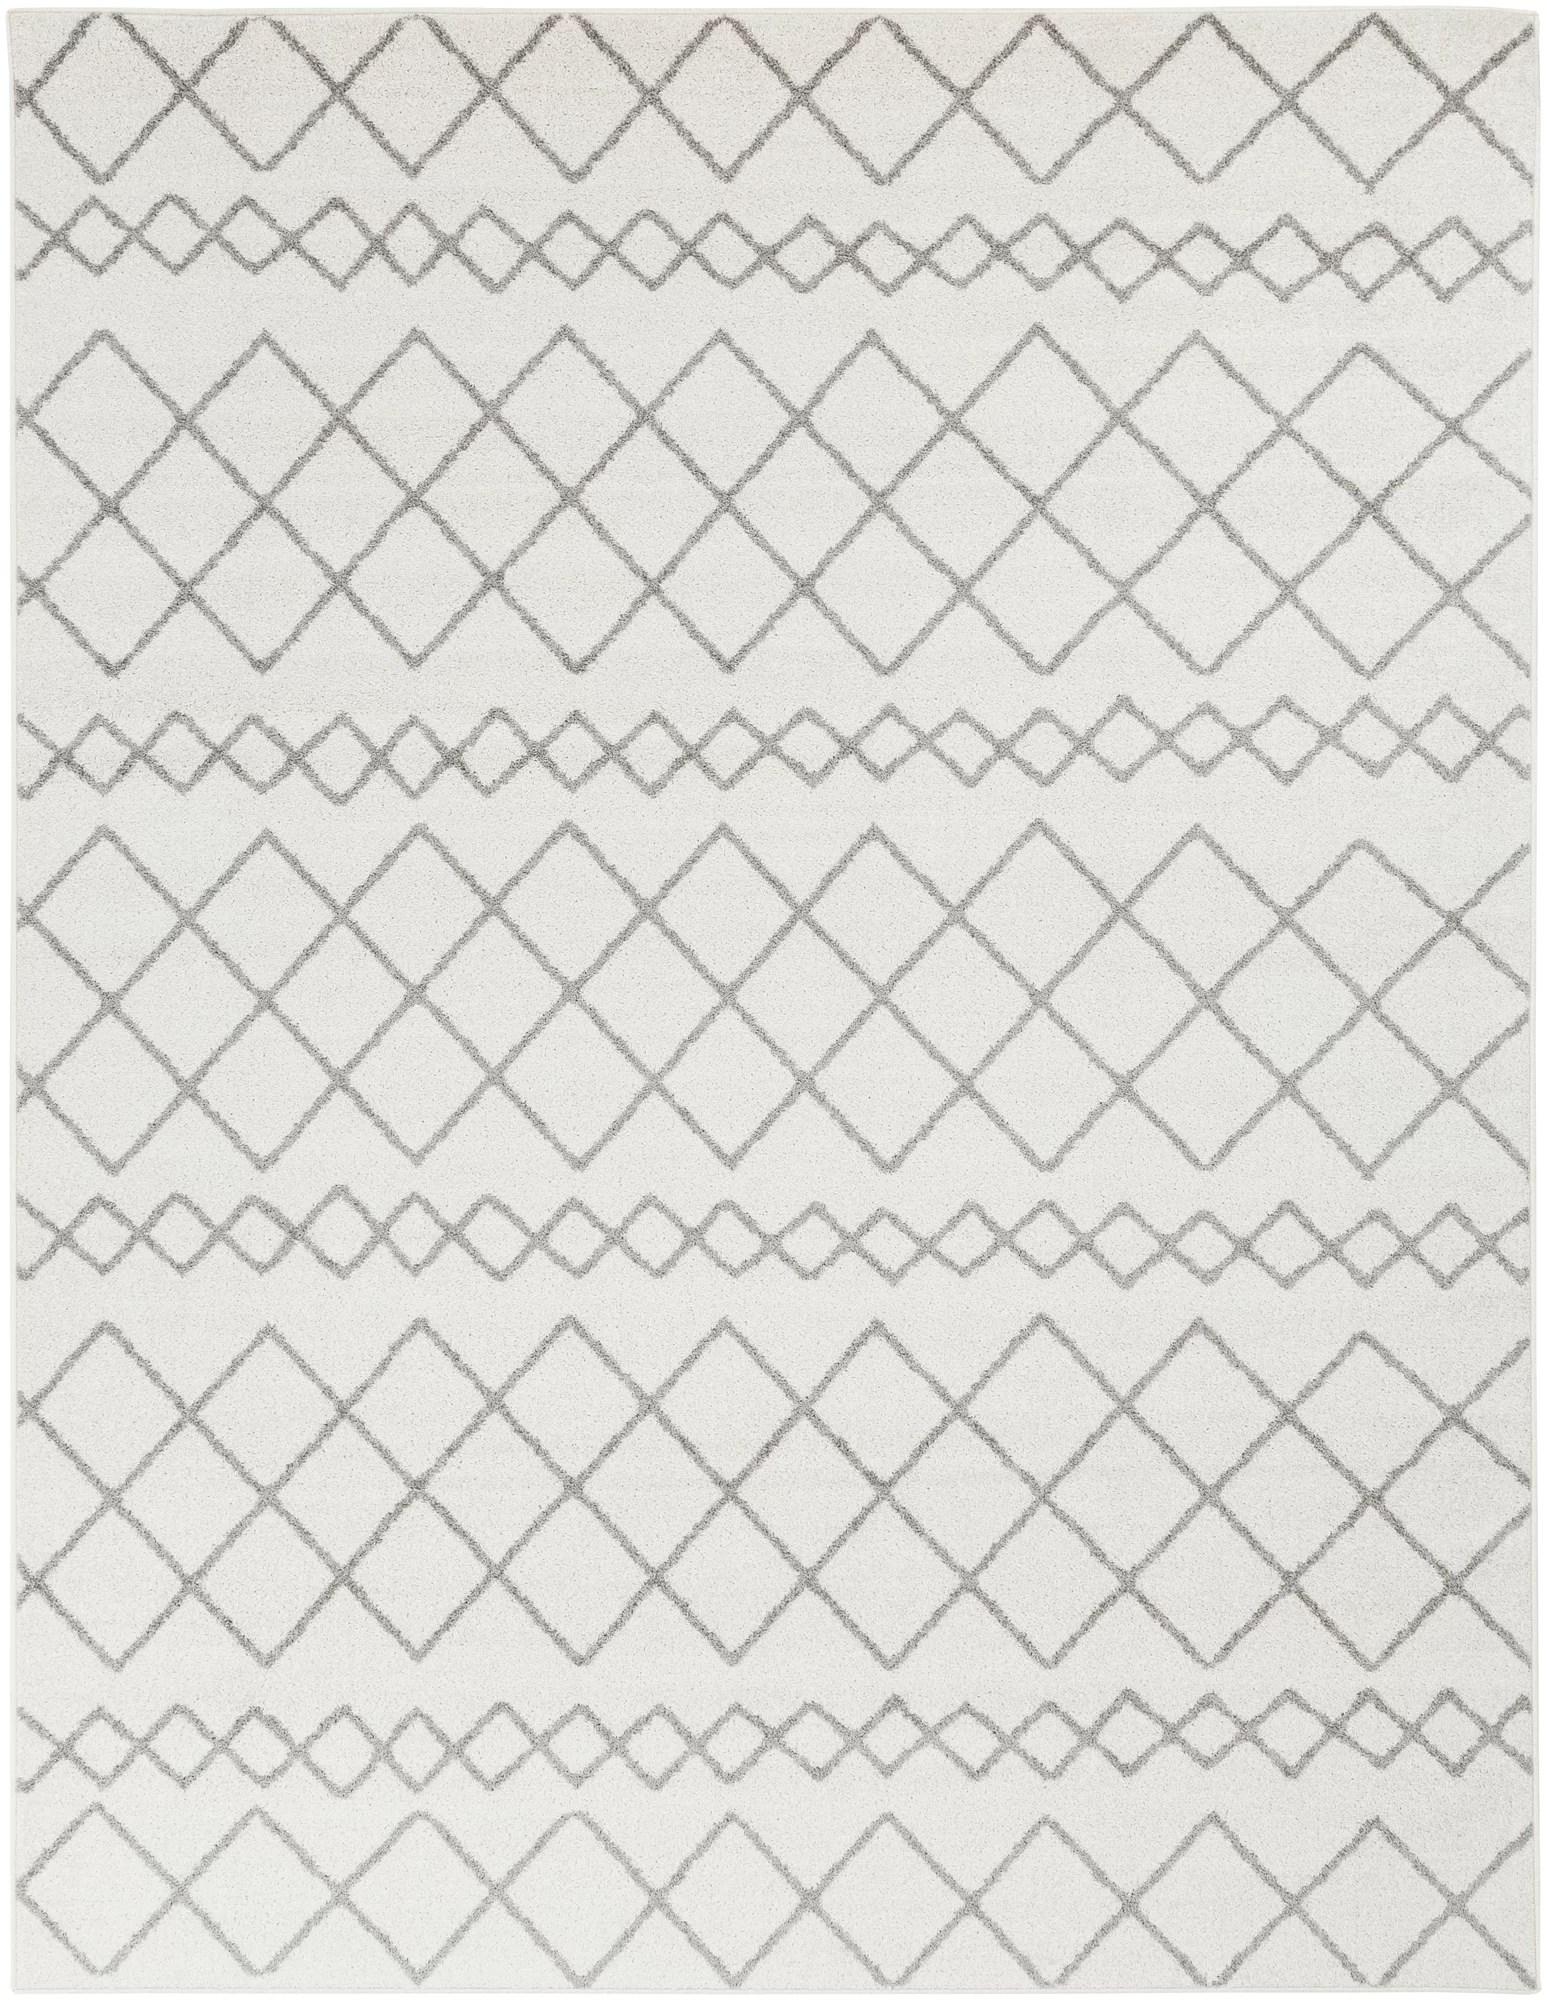 Union Rustic Calzada Global Gray White Area Rug